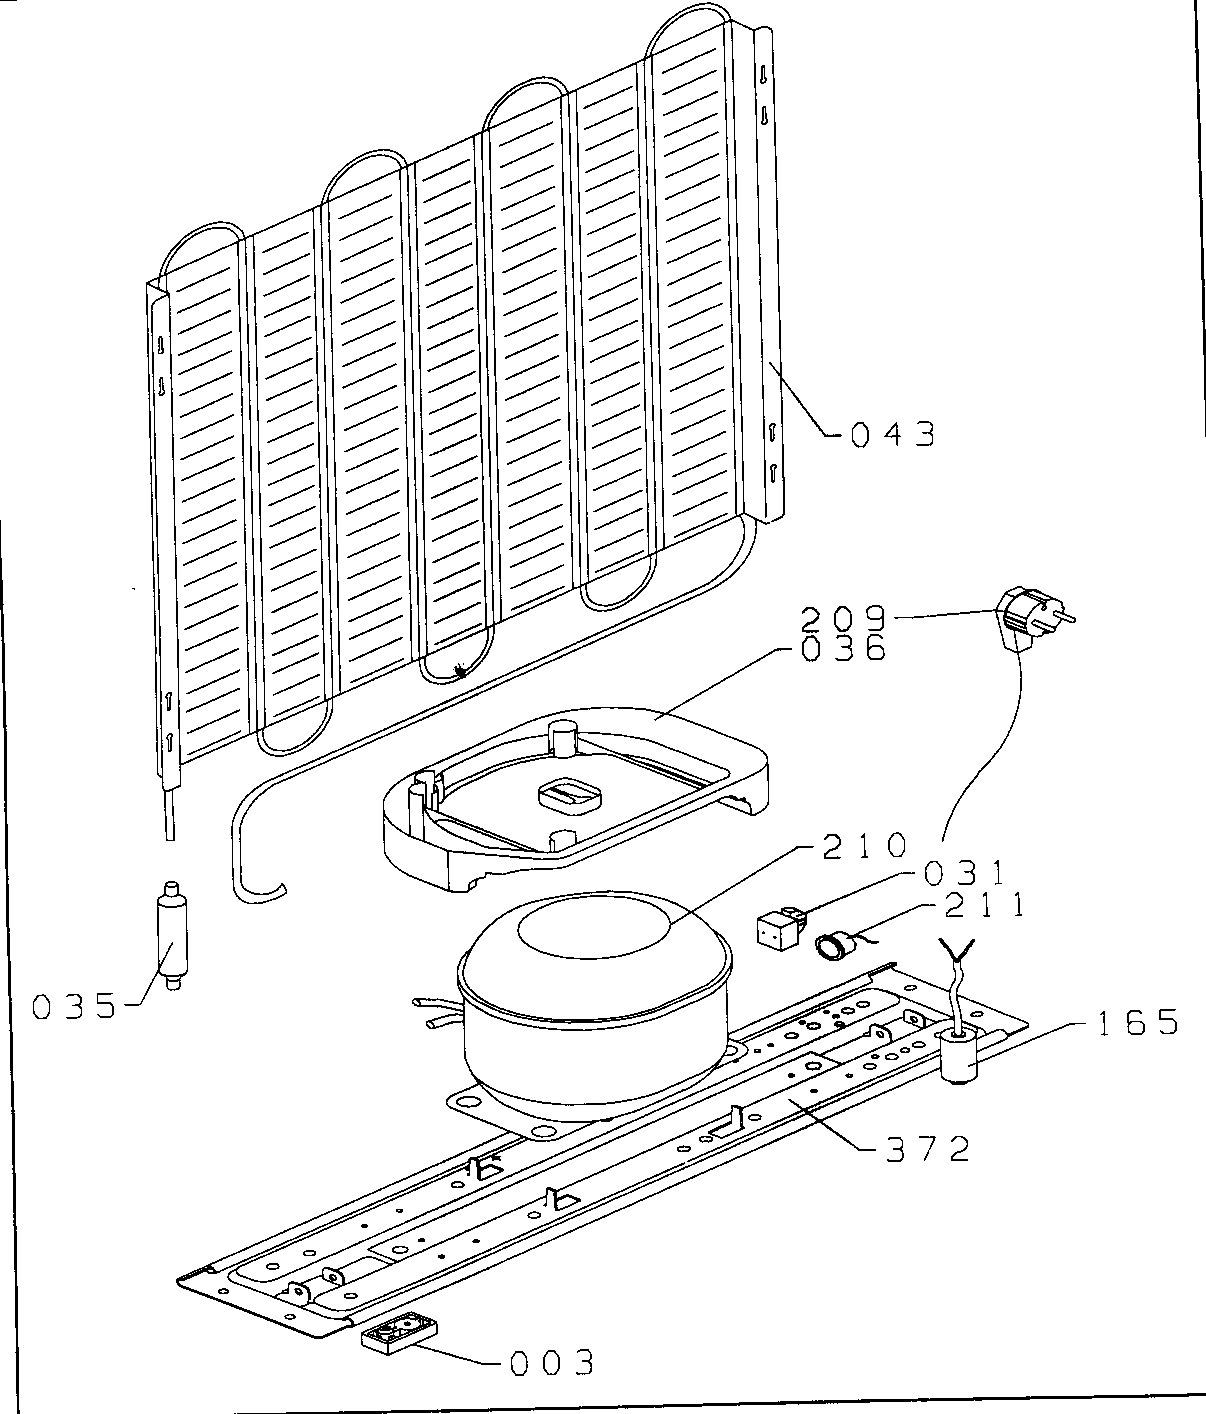 COMPRESSOR Diagram & Parts List for Model d1012w Danby